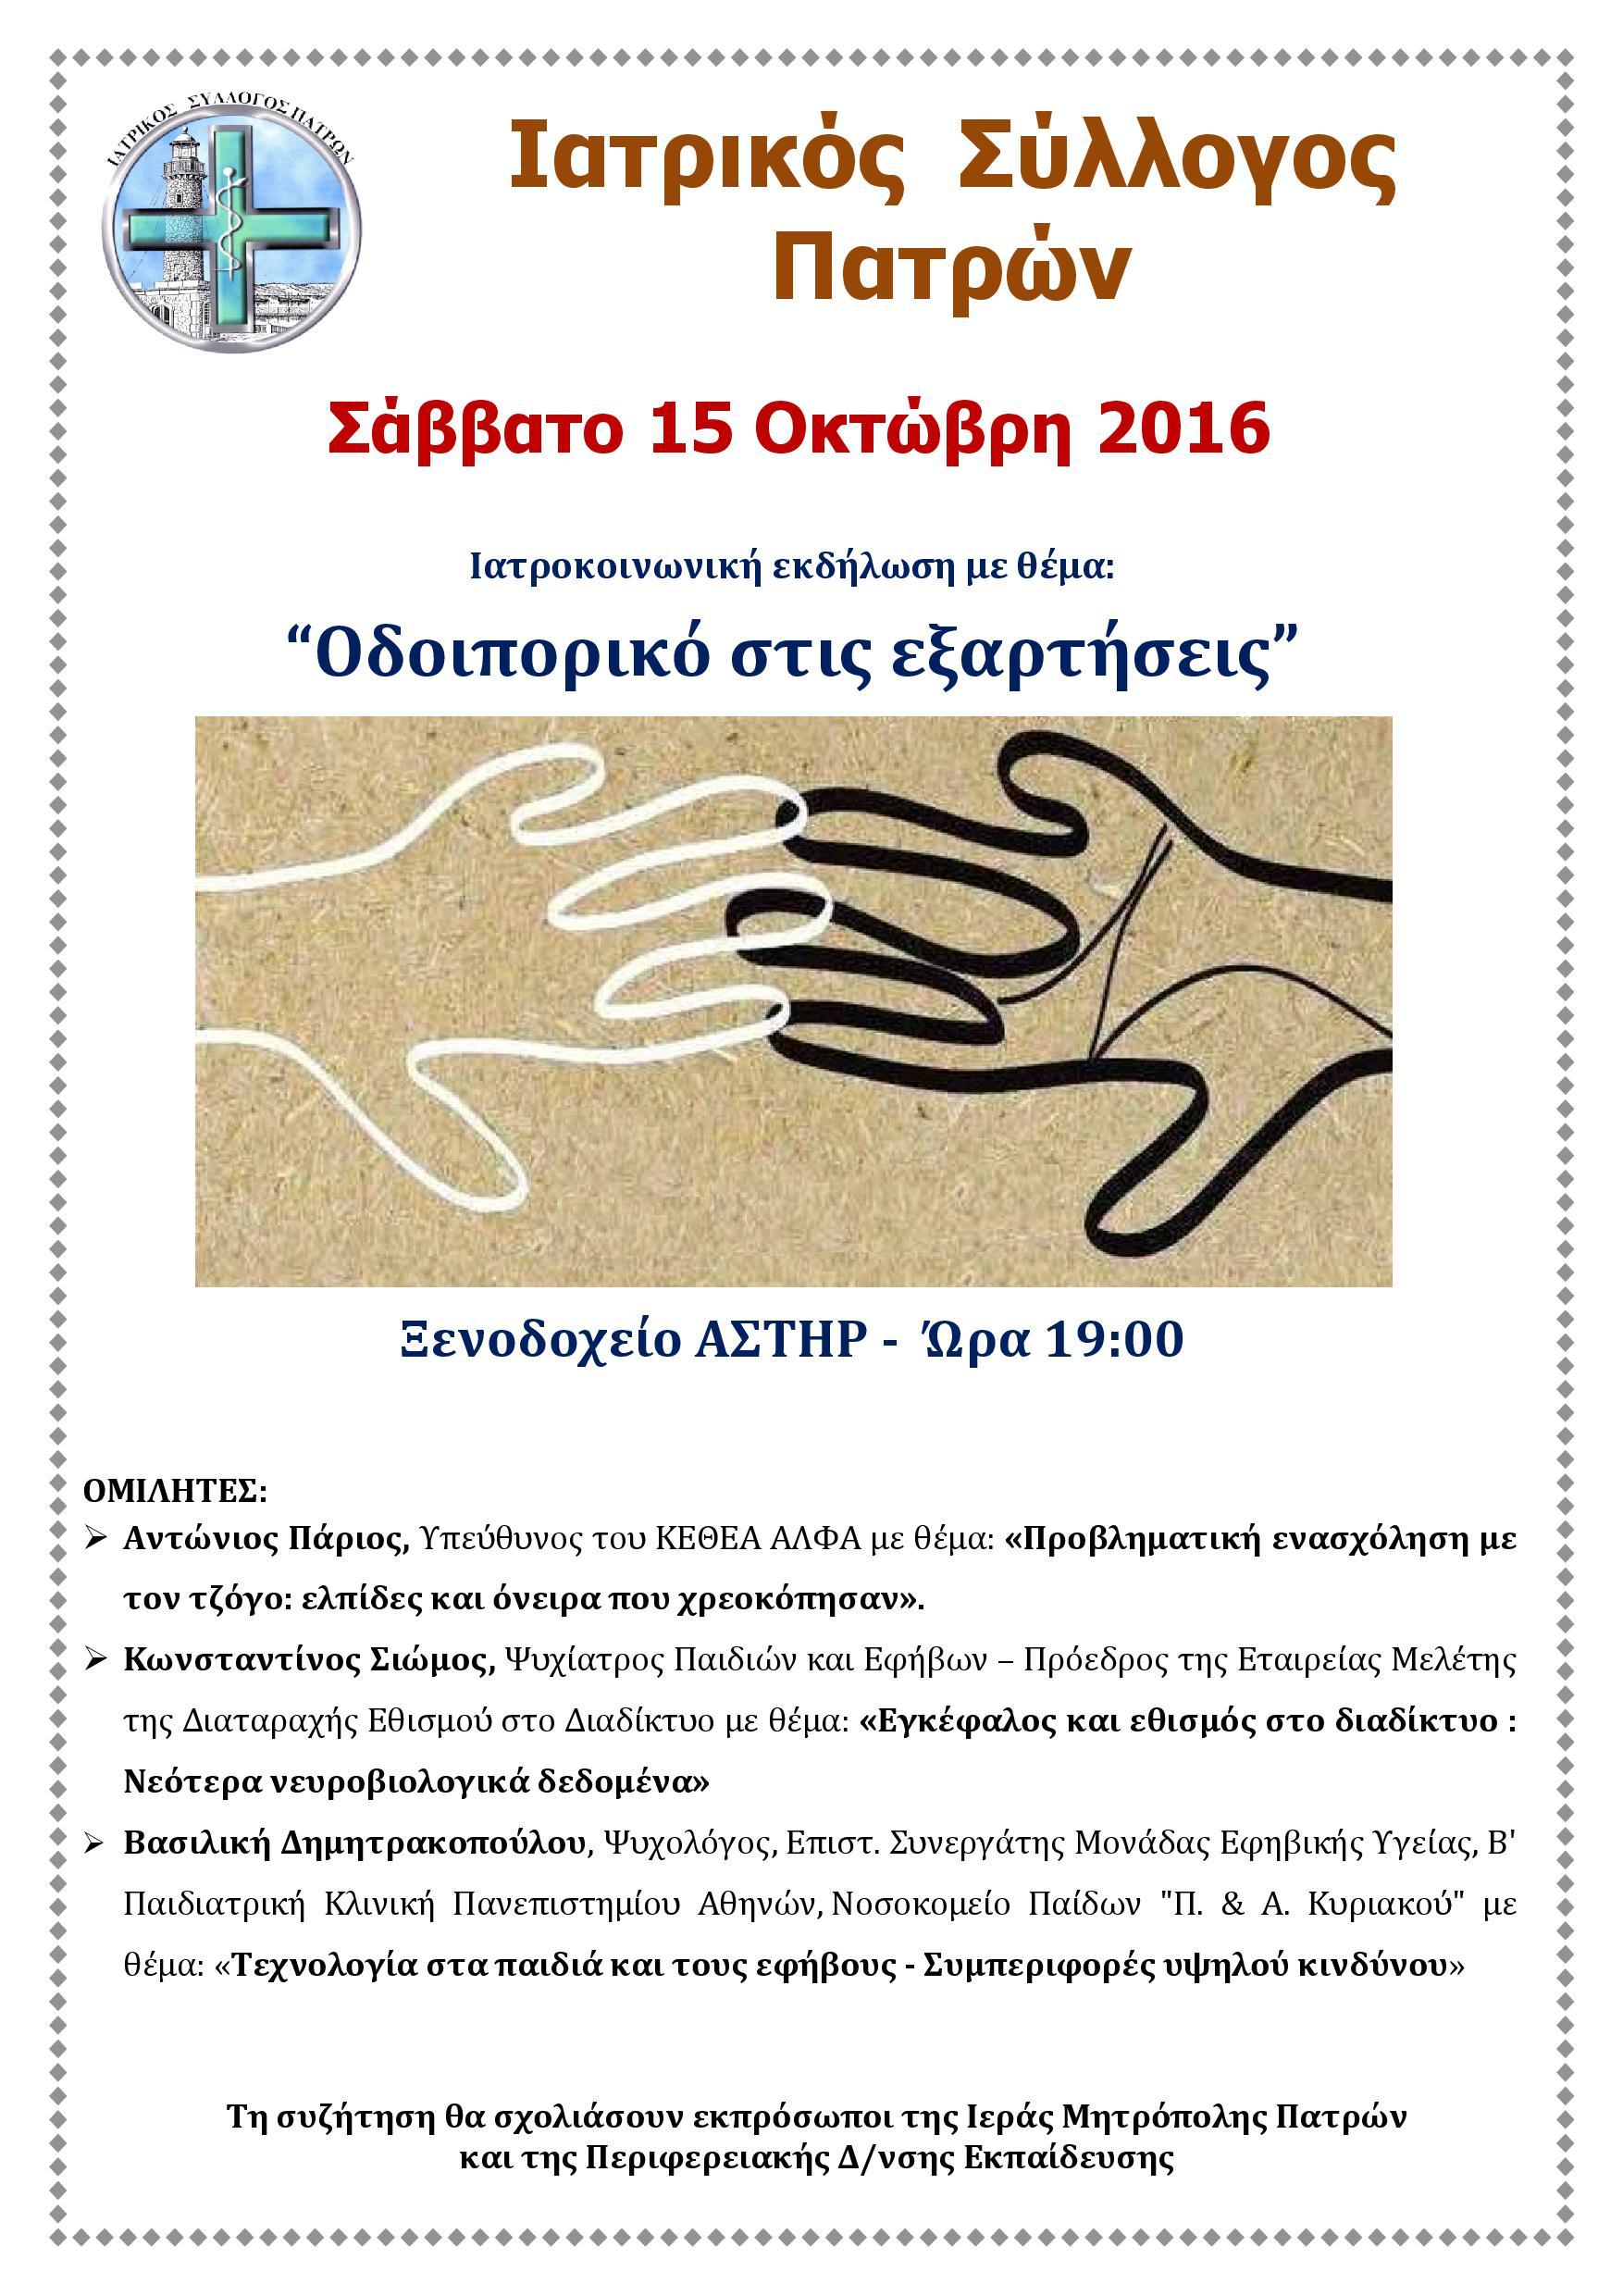 f4668156dd49 Εκδηλώσεις Ιατρικού Συλλόγου Πατρών στις 15   16 Οκτωβρίου 2016 ...